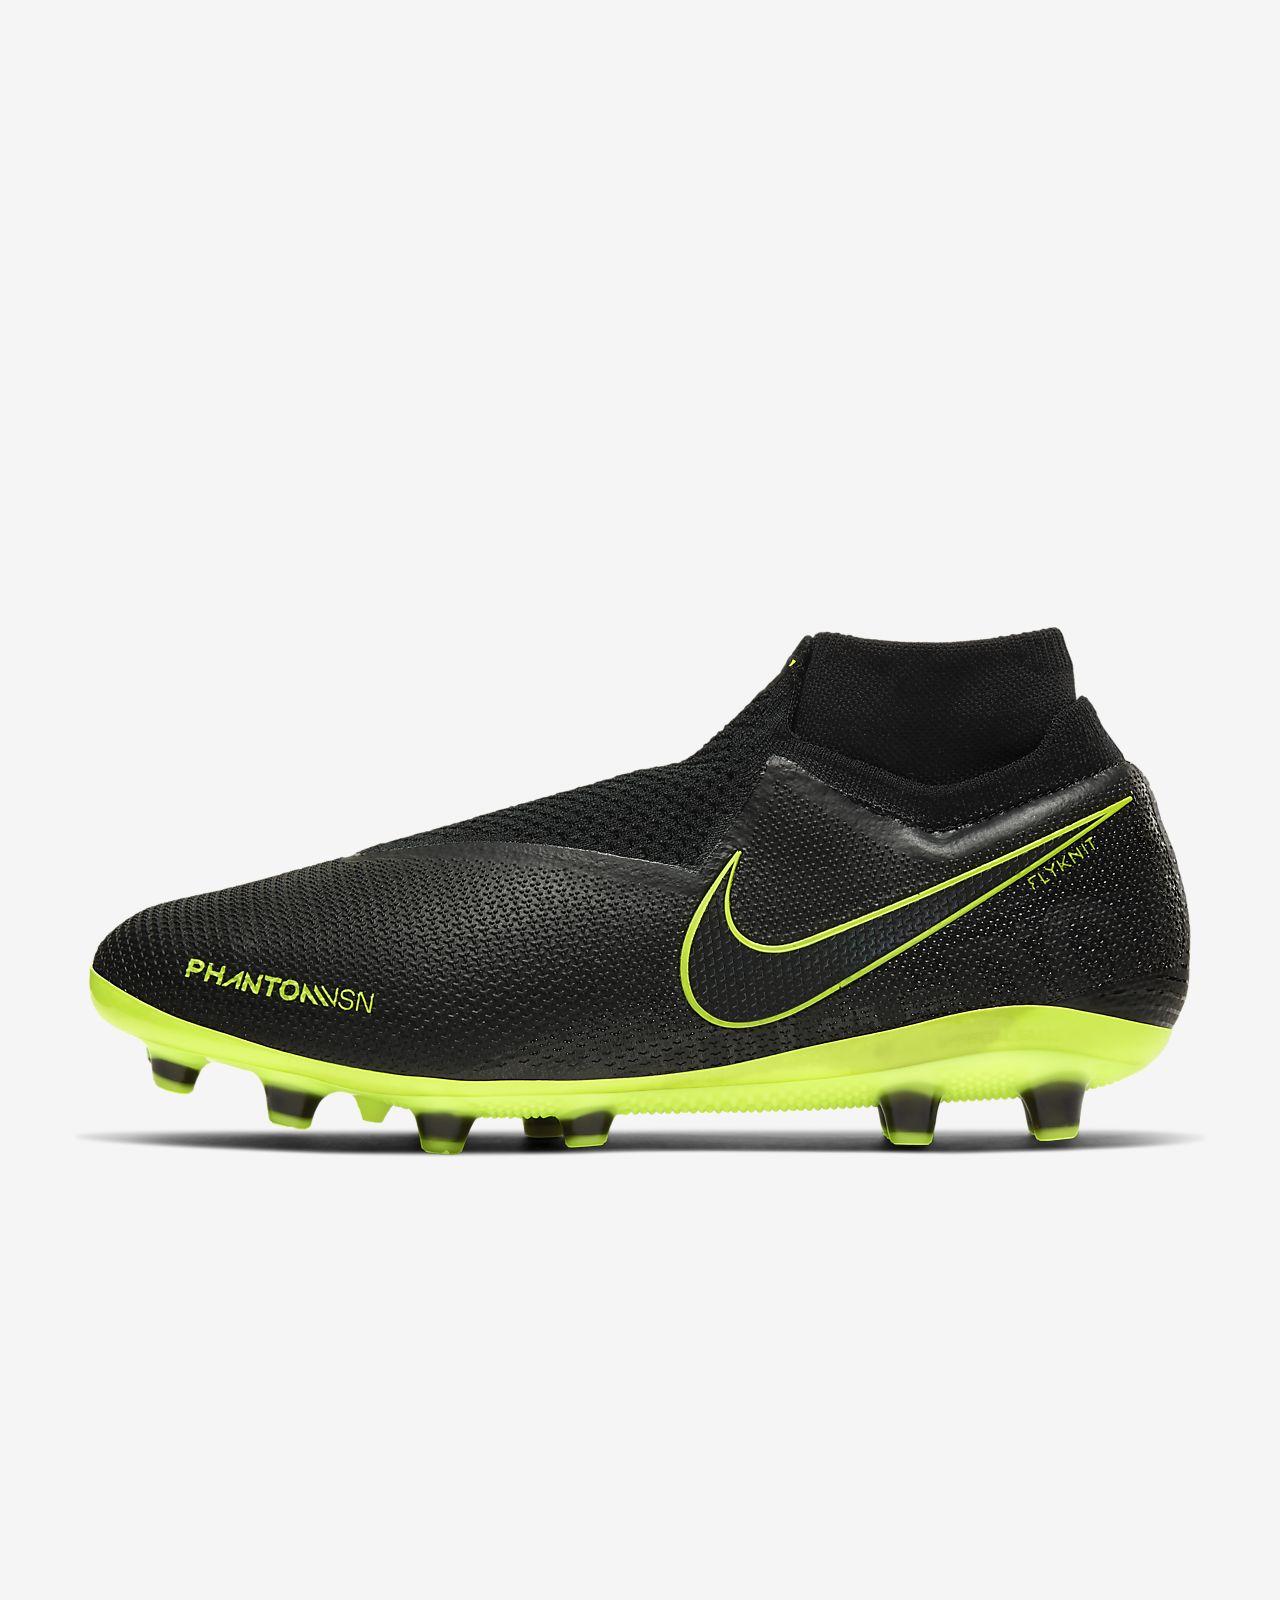 Nike Phantom Vision Elite Dynamic Fit Fussballschuh Fur Kunstrasen